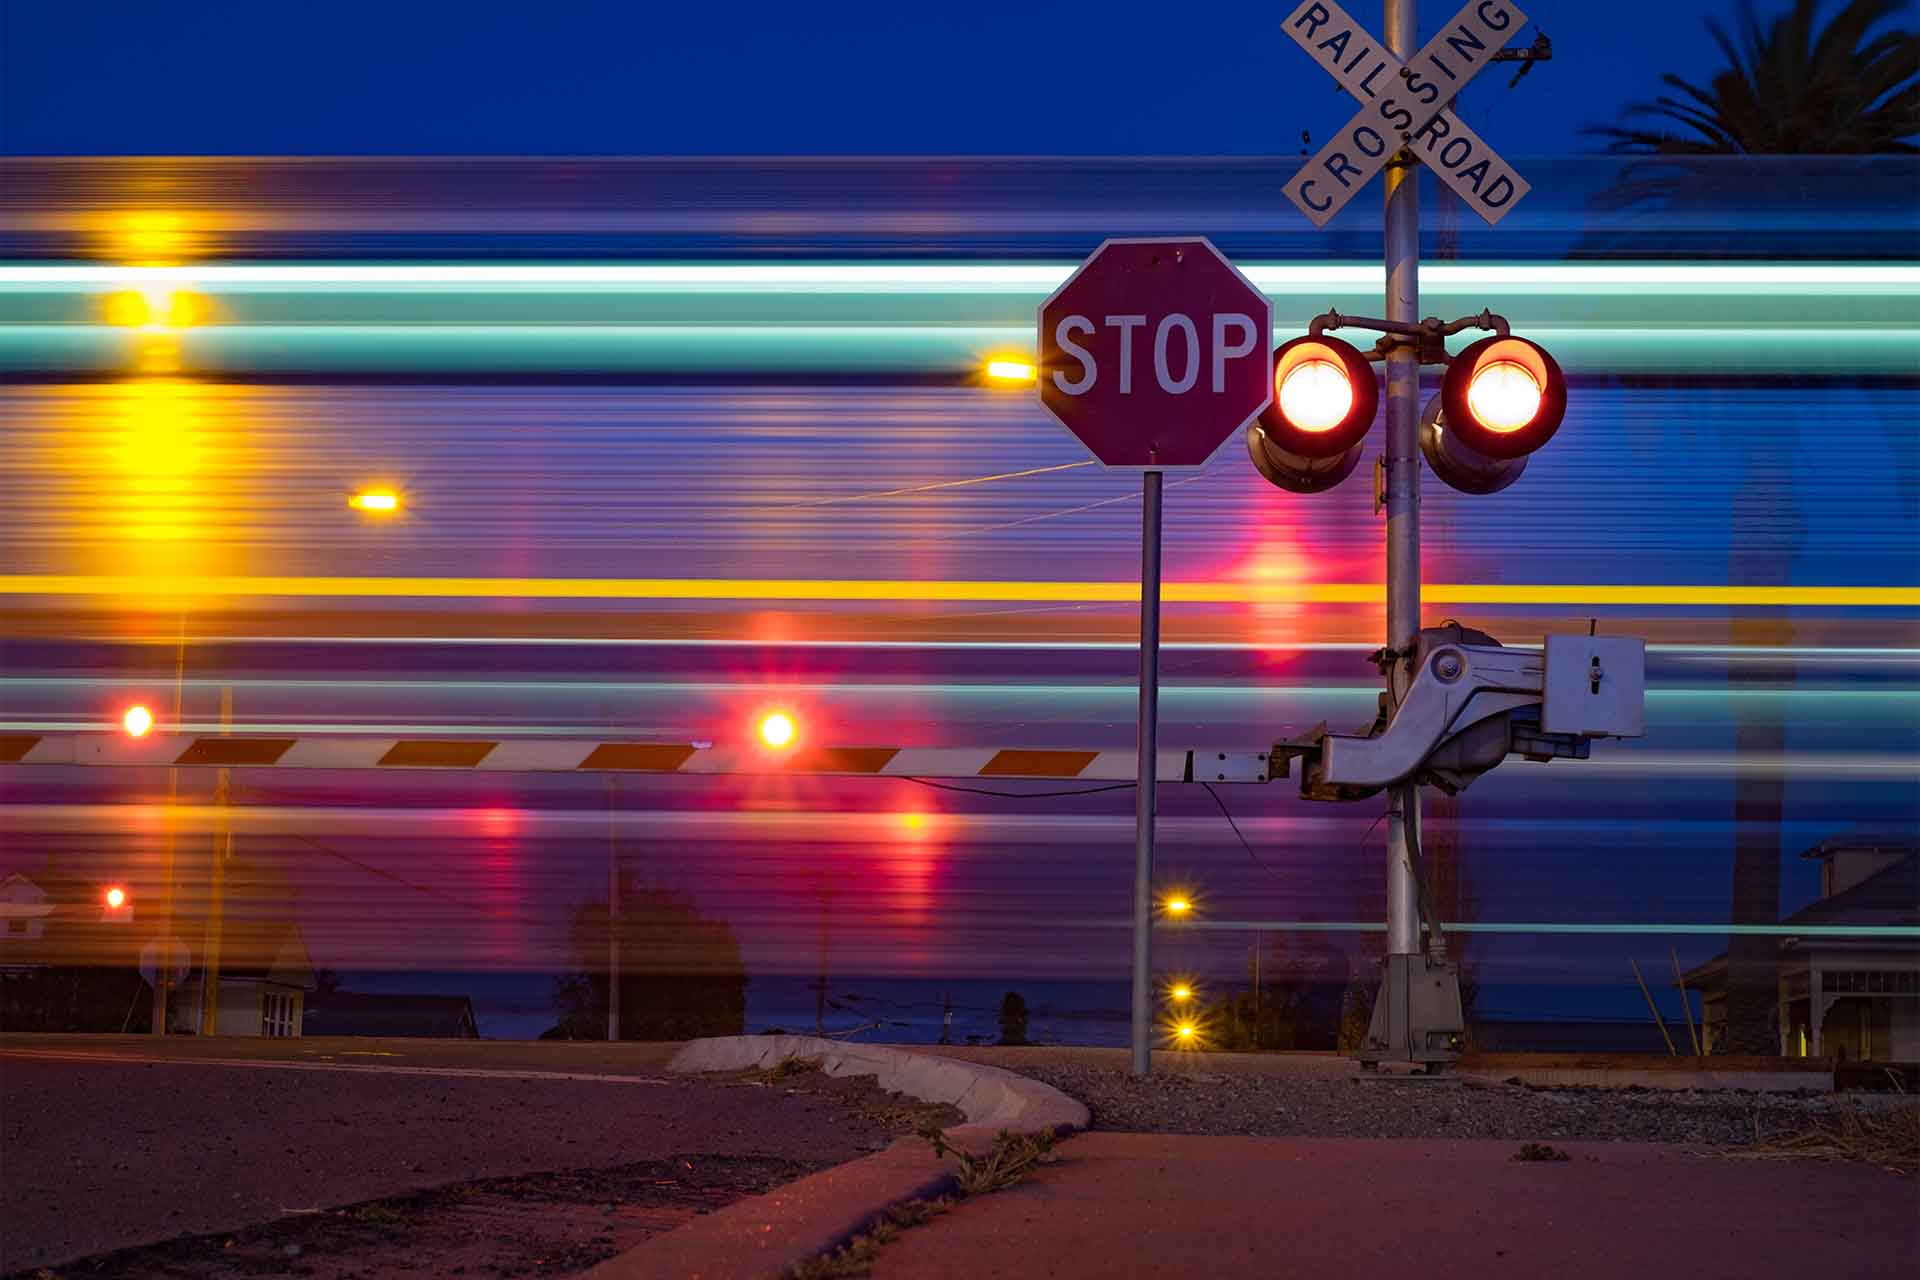 t2informatik Blog: Stop agility